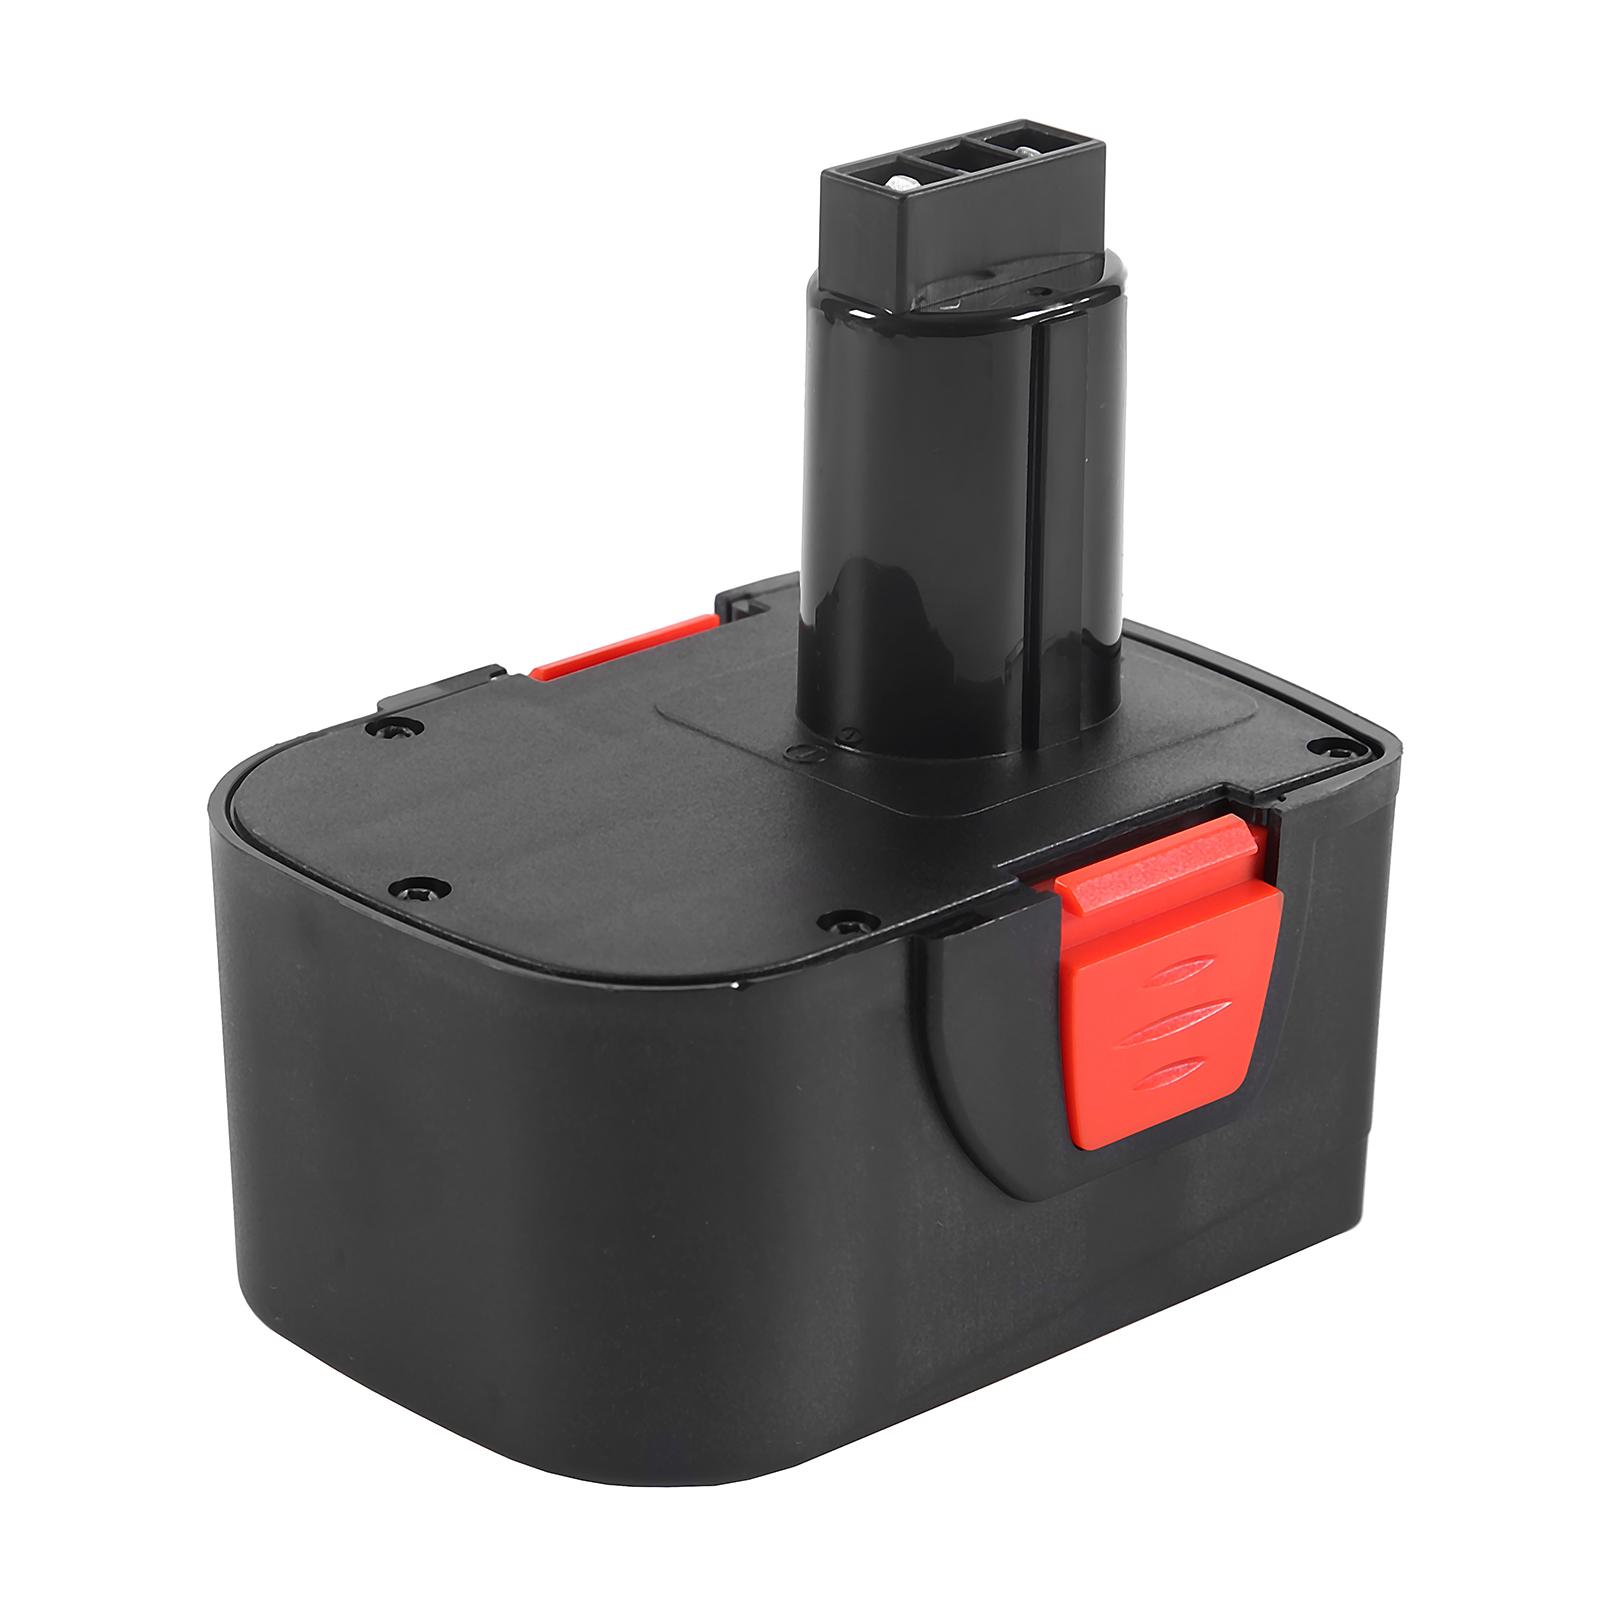 Аккумулятор Hammer Aki1415 14,4В 1,5Ач акита настенная вешалка 52х23 см лаванда aki 314 11